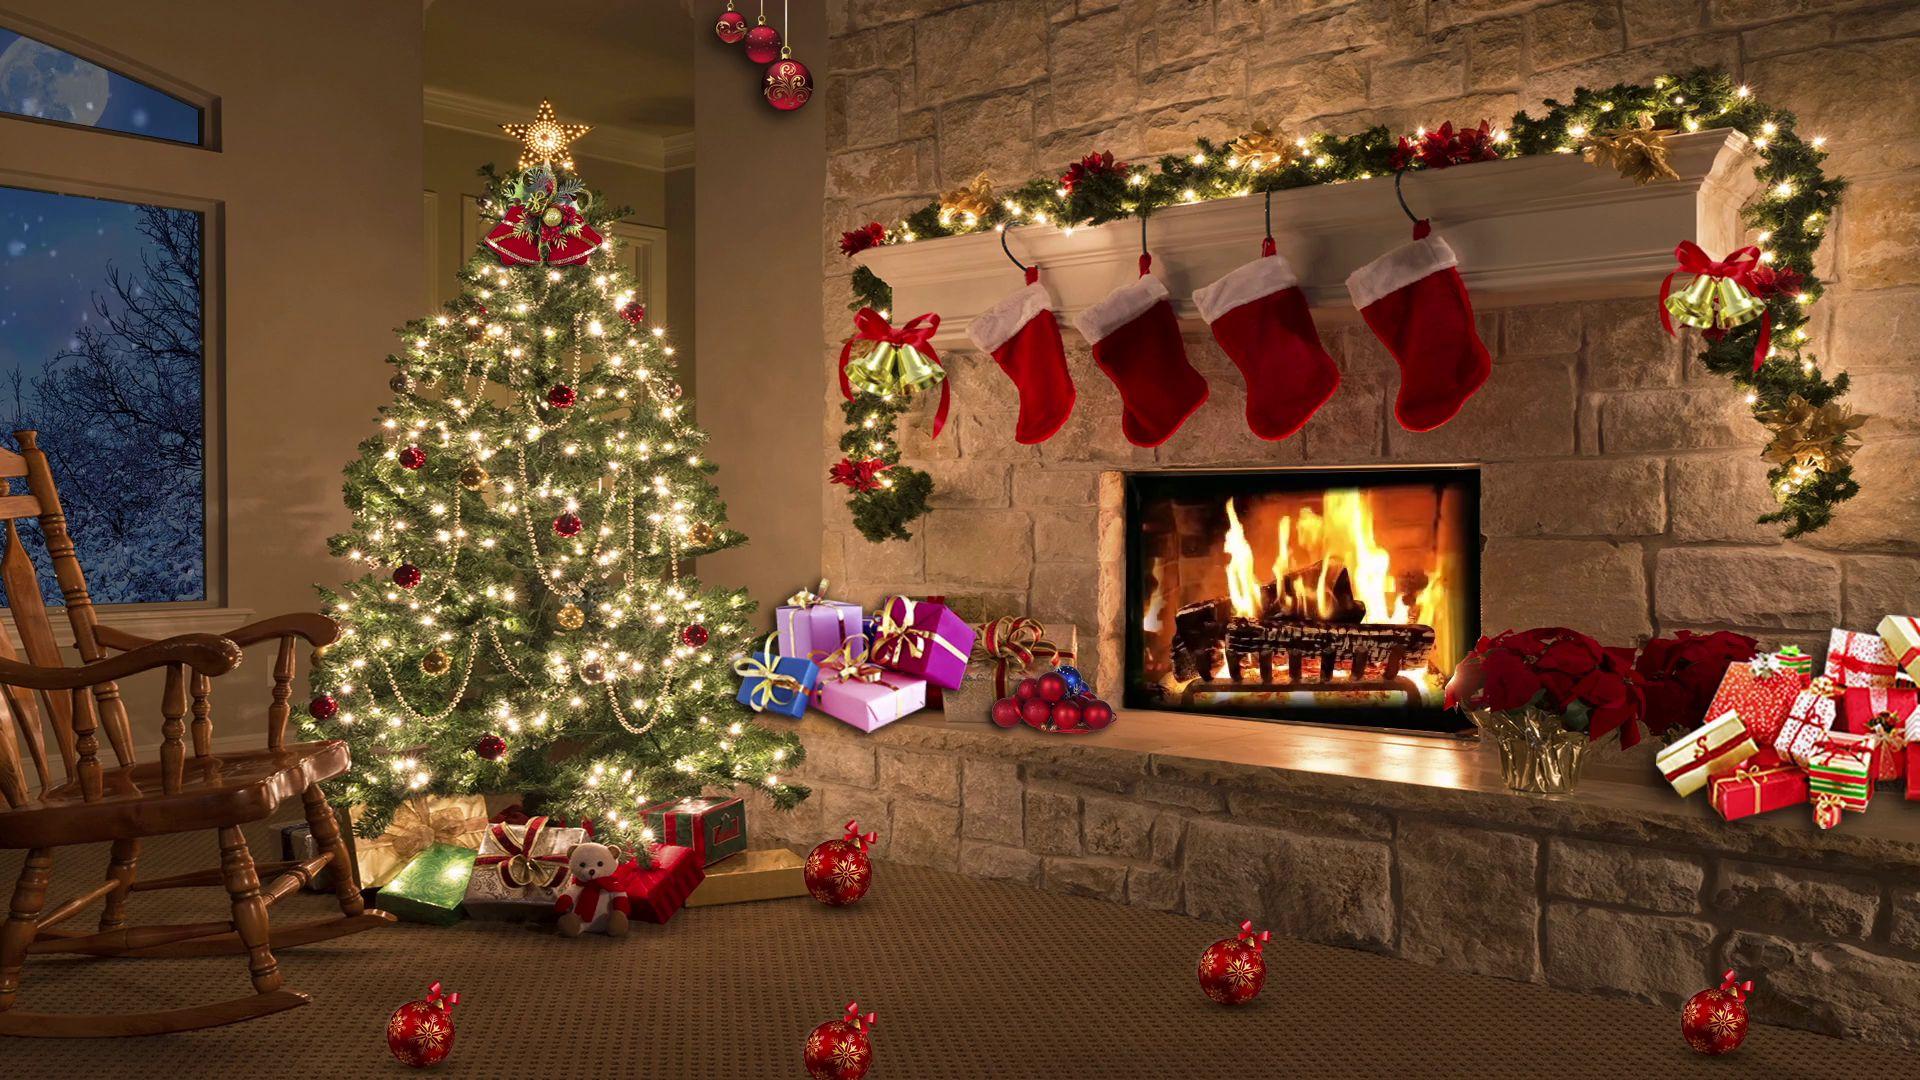 Christmas Fireplace Comfort Wallpaper Theme